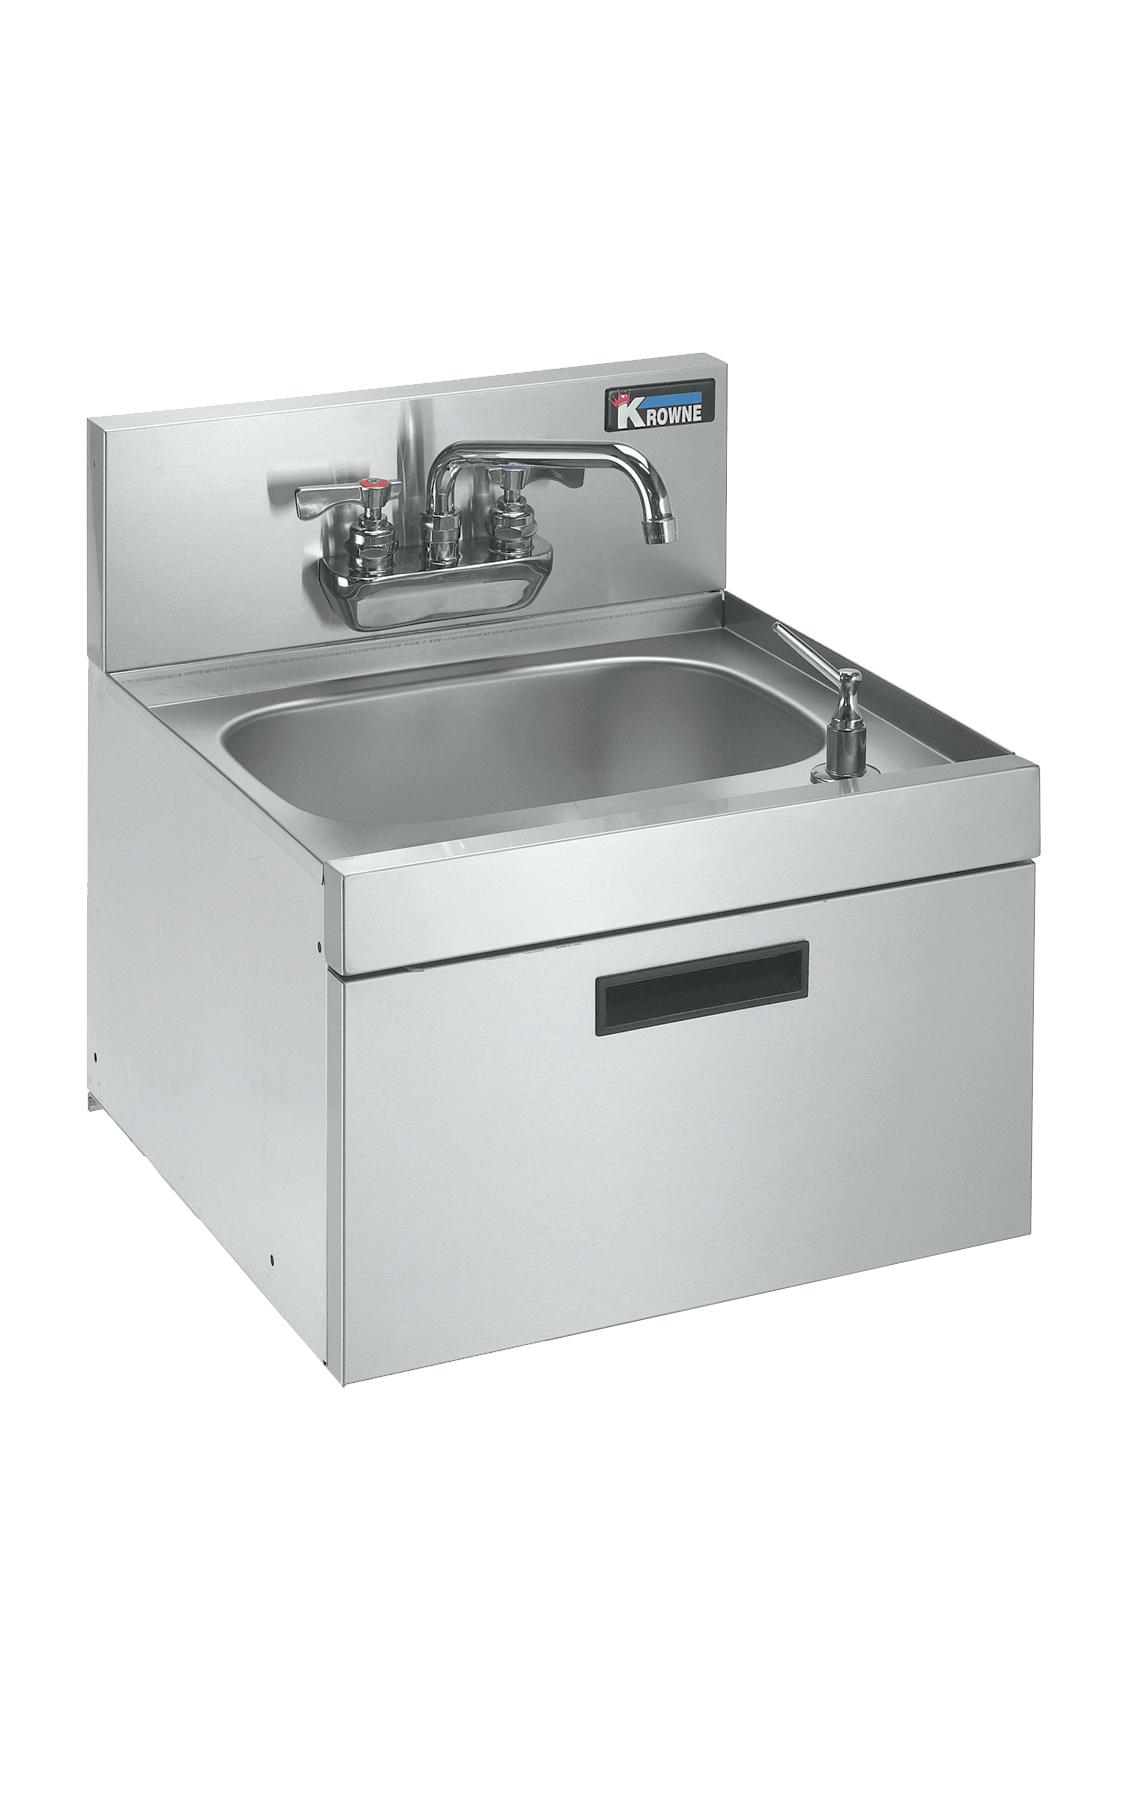 Krowne Metal KR19-18WST underbar hand sink unit